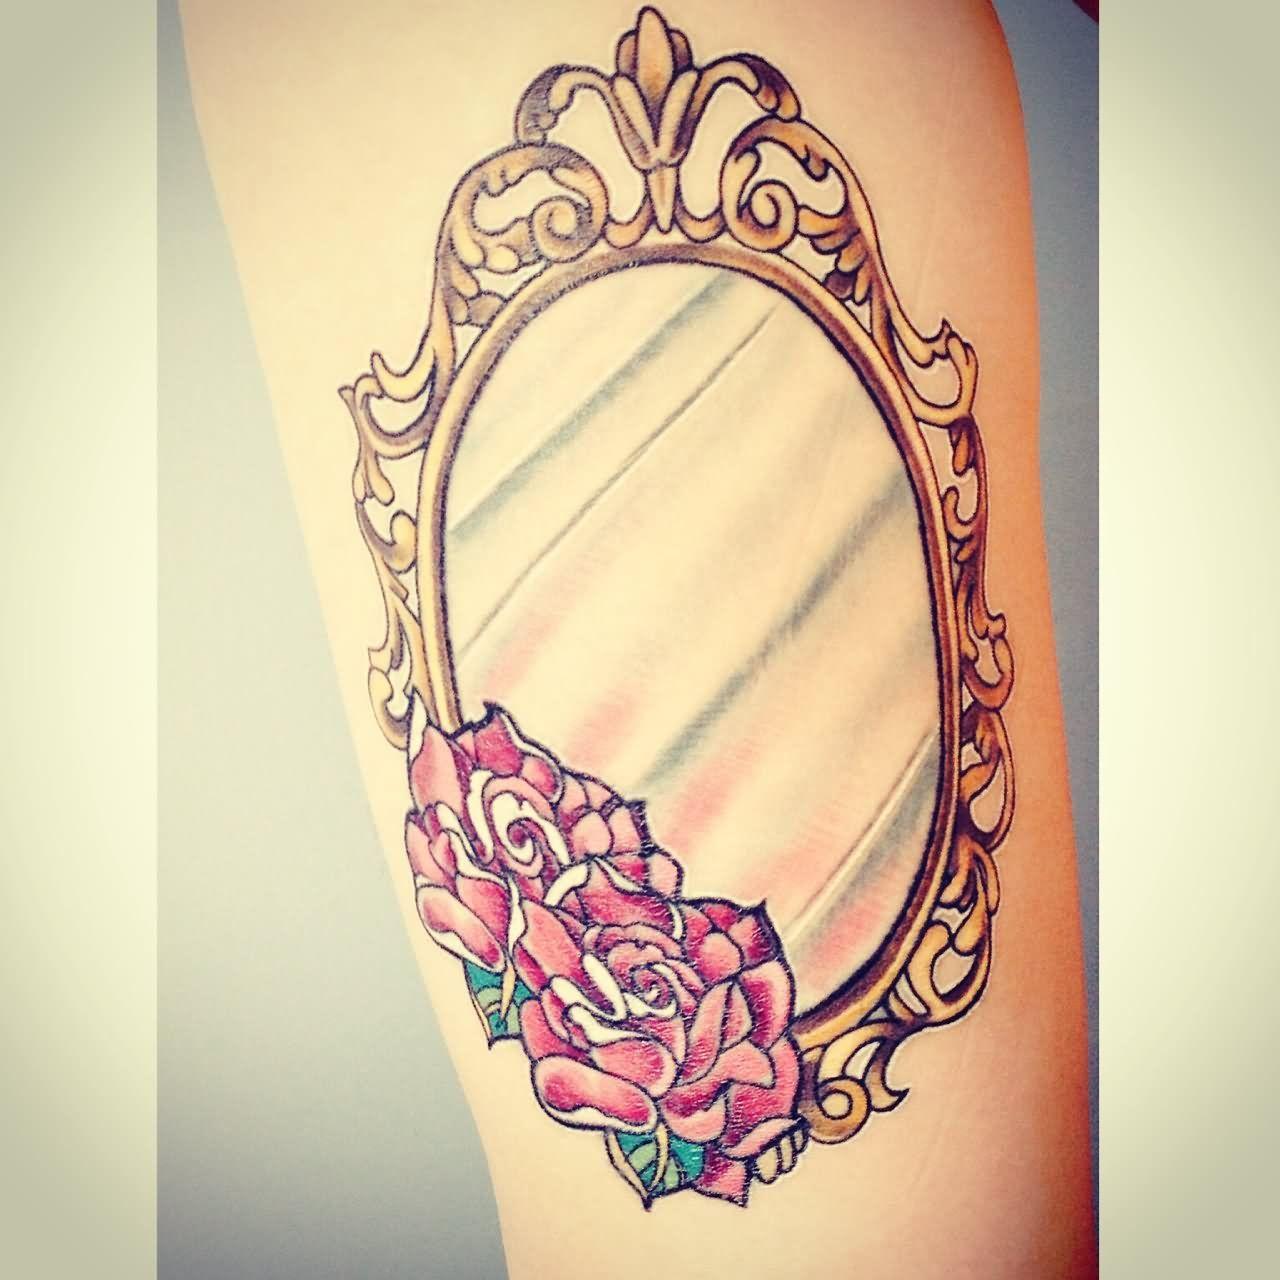 26 Girly Mirror Tattoos | Tattoos, Mirror tattoos